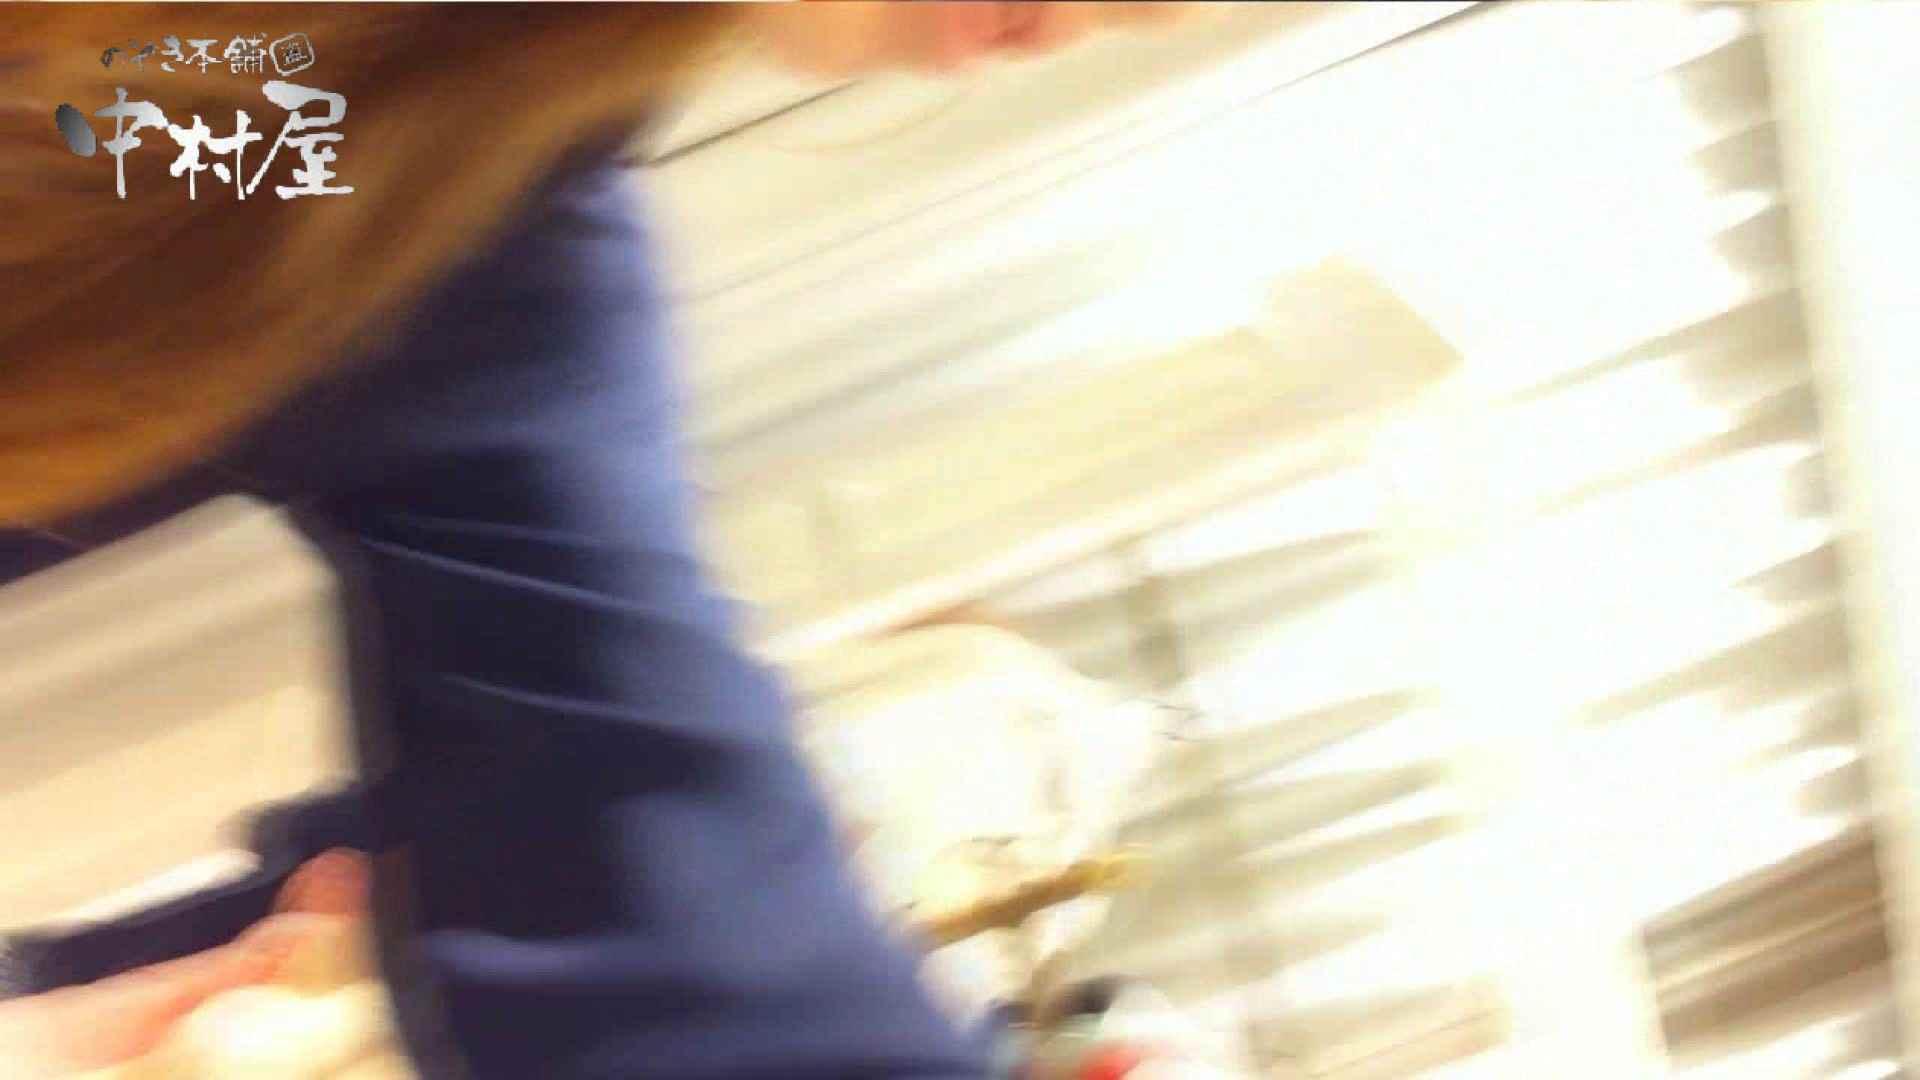 vol.66 美人アパレル胸チラ&パンチラ 店員さんのパンツはストライプ 胸チラ 隠し撮りセックス画像 87PICs 49